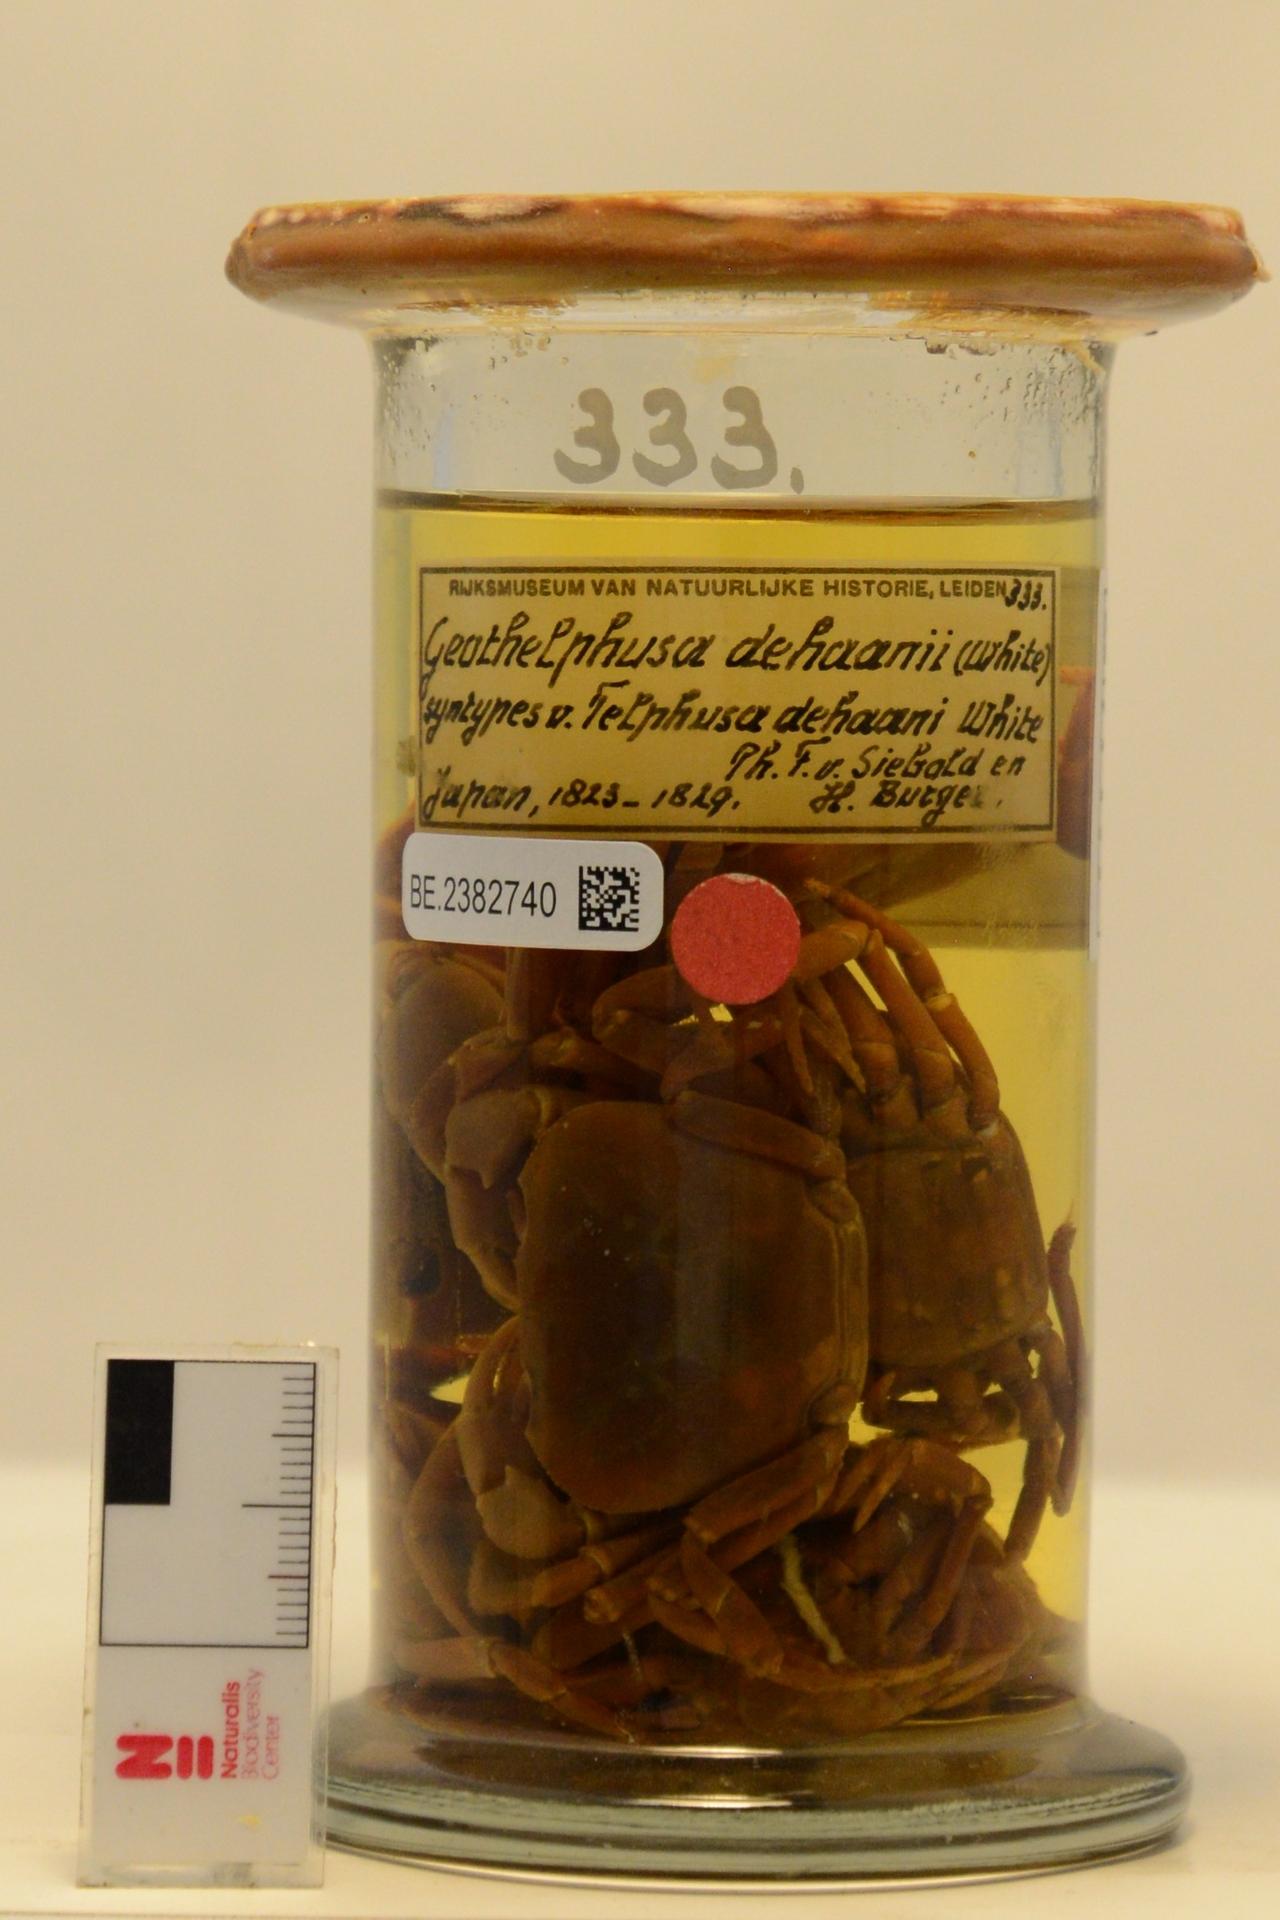 RMNH.CRUS.D.333   Geothelphusa dehaani (White, 1847)